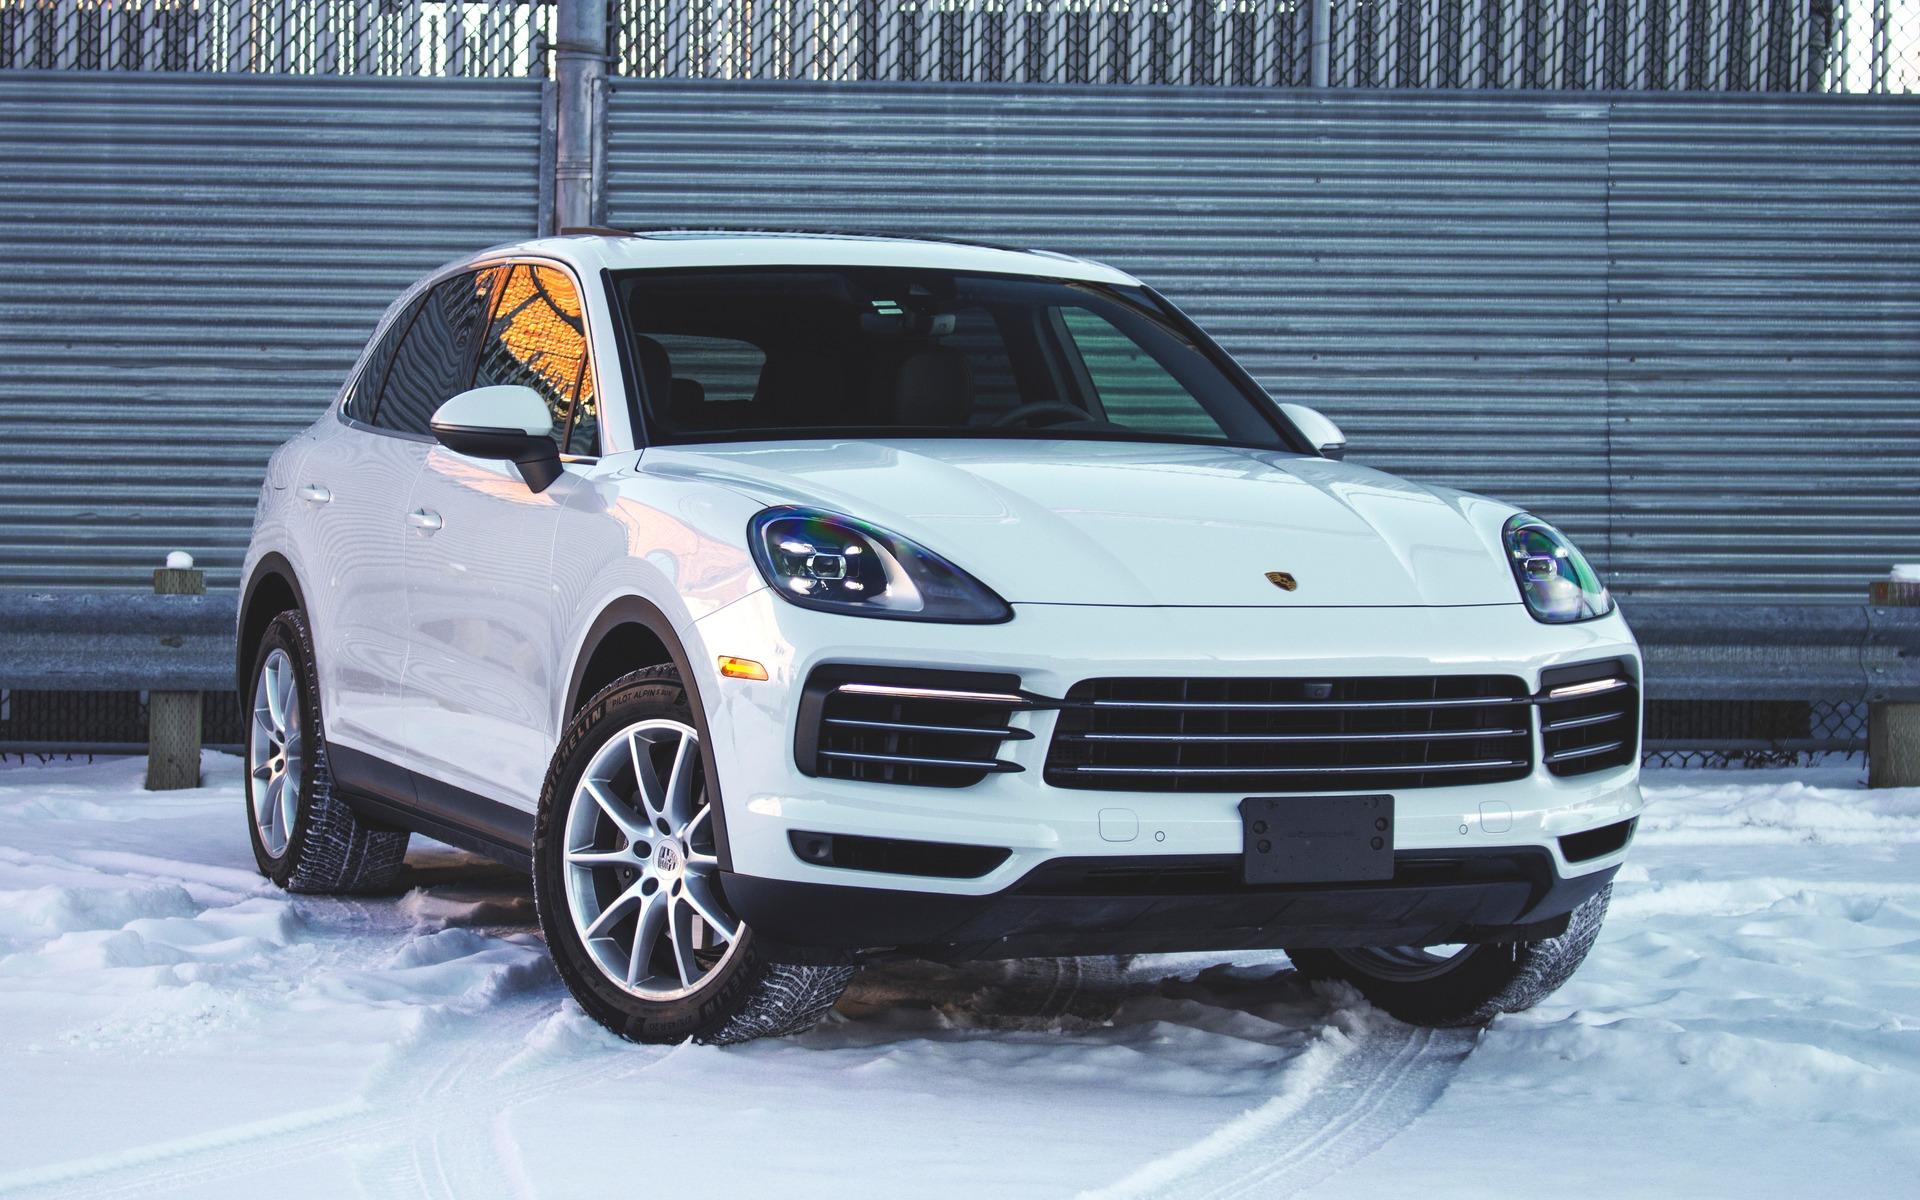 Porsche Cayenne 2019 : machine à tout faire 356627_2019_Porsche_Cayenne